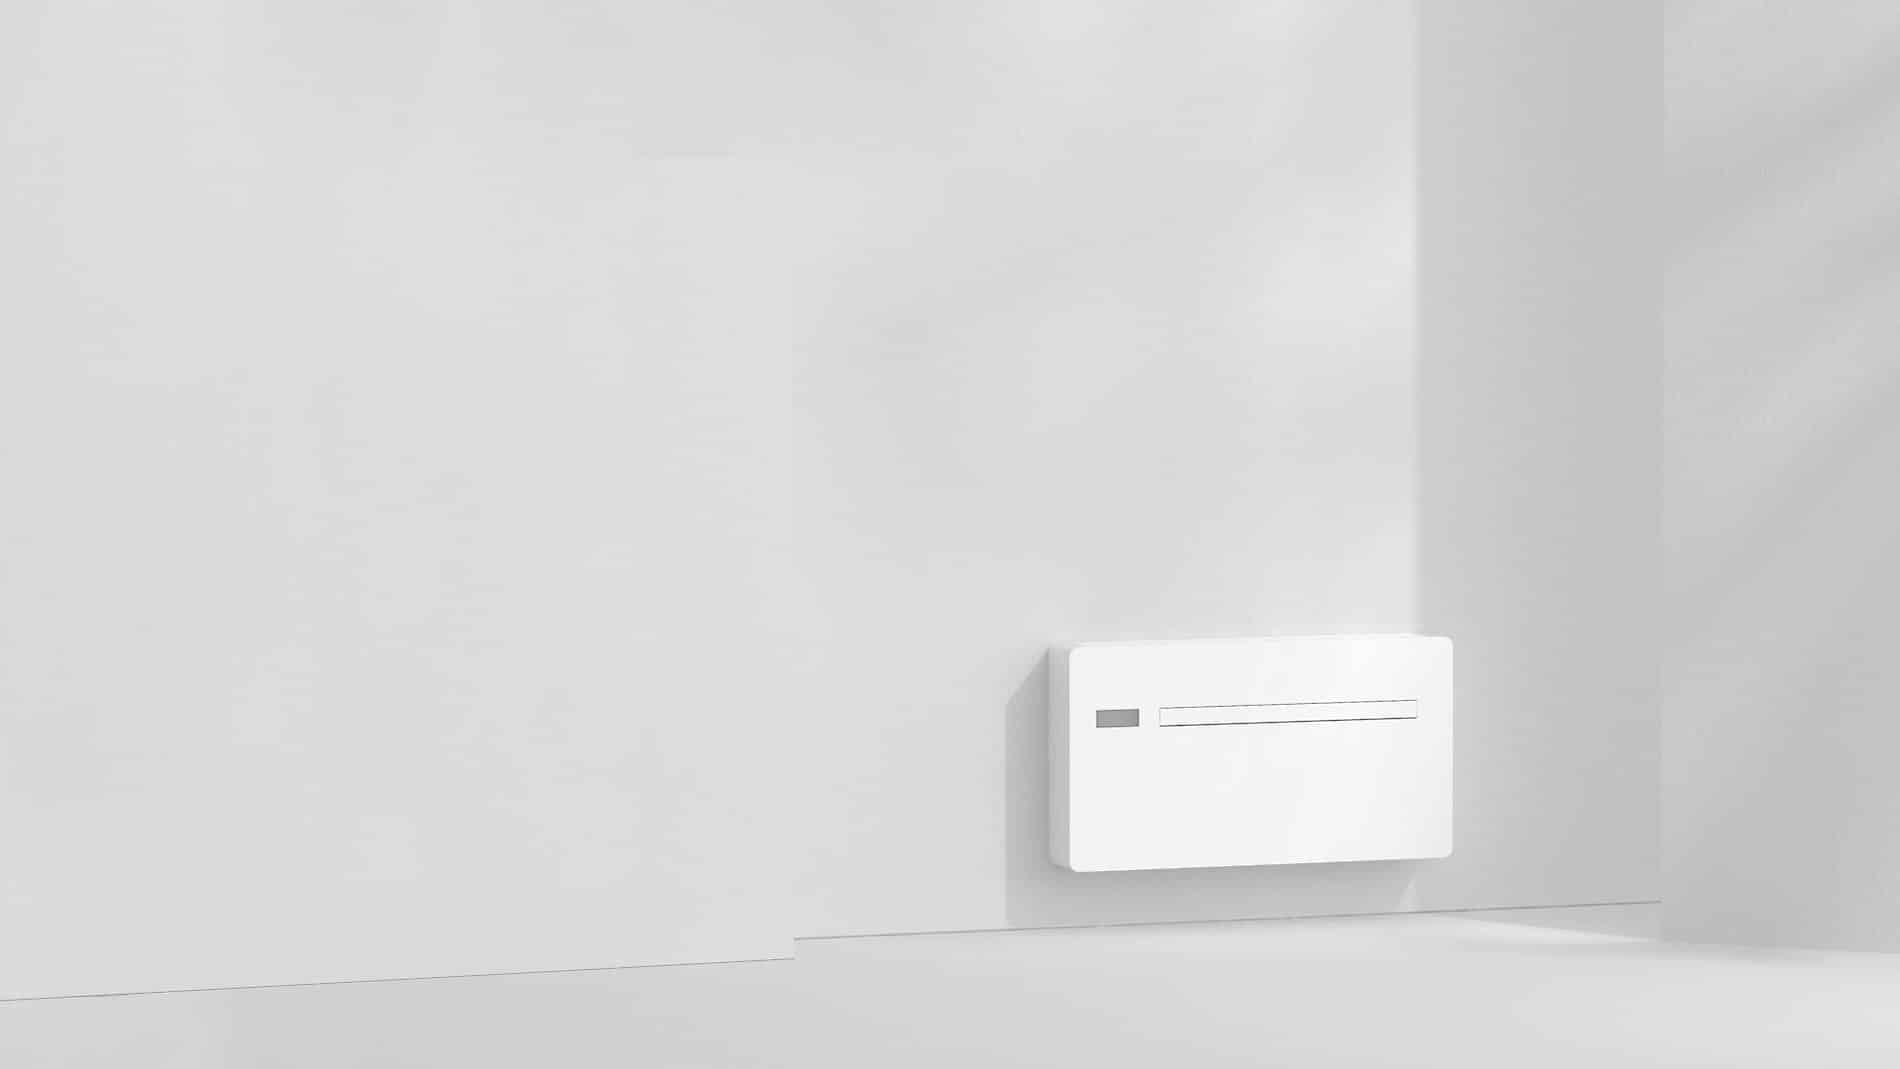 Green House Solutions zonnepanelen batterijopslag laadpalen airconditioning famiglia 2 0 16 9.1900x0 1